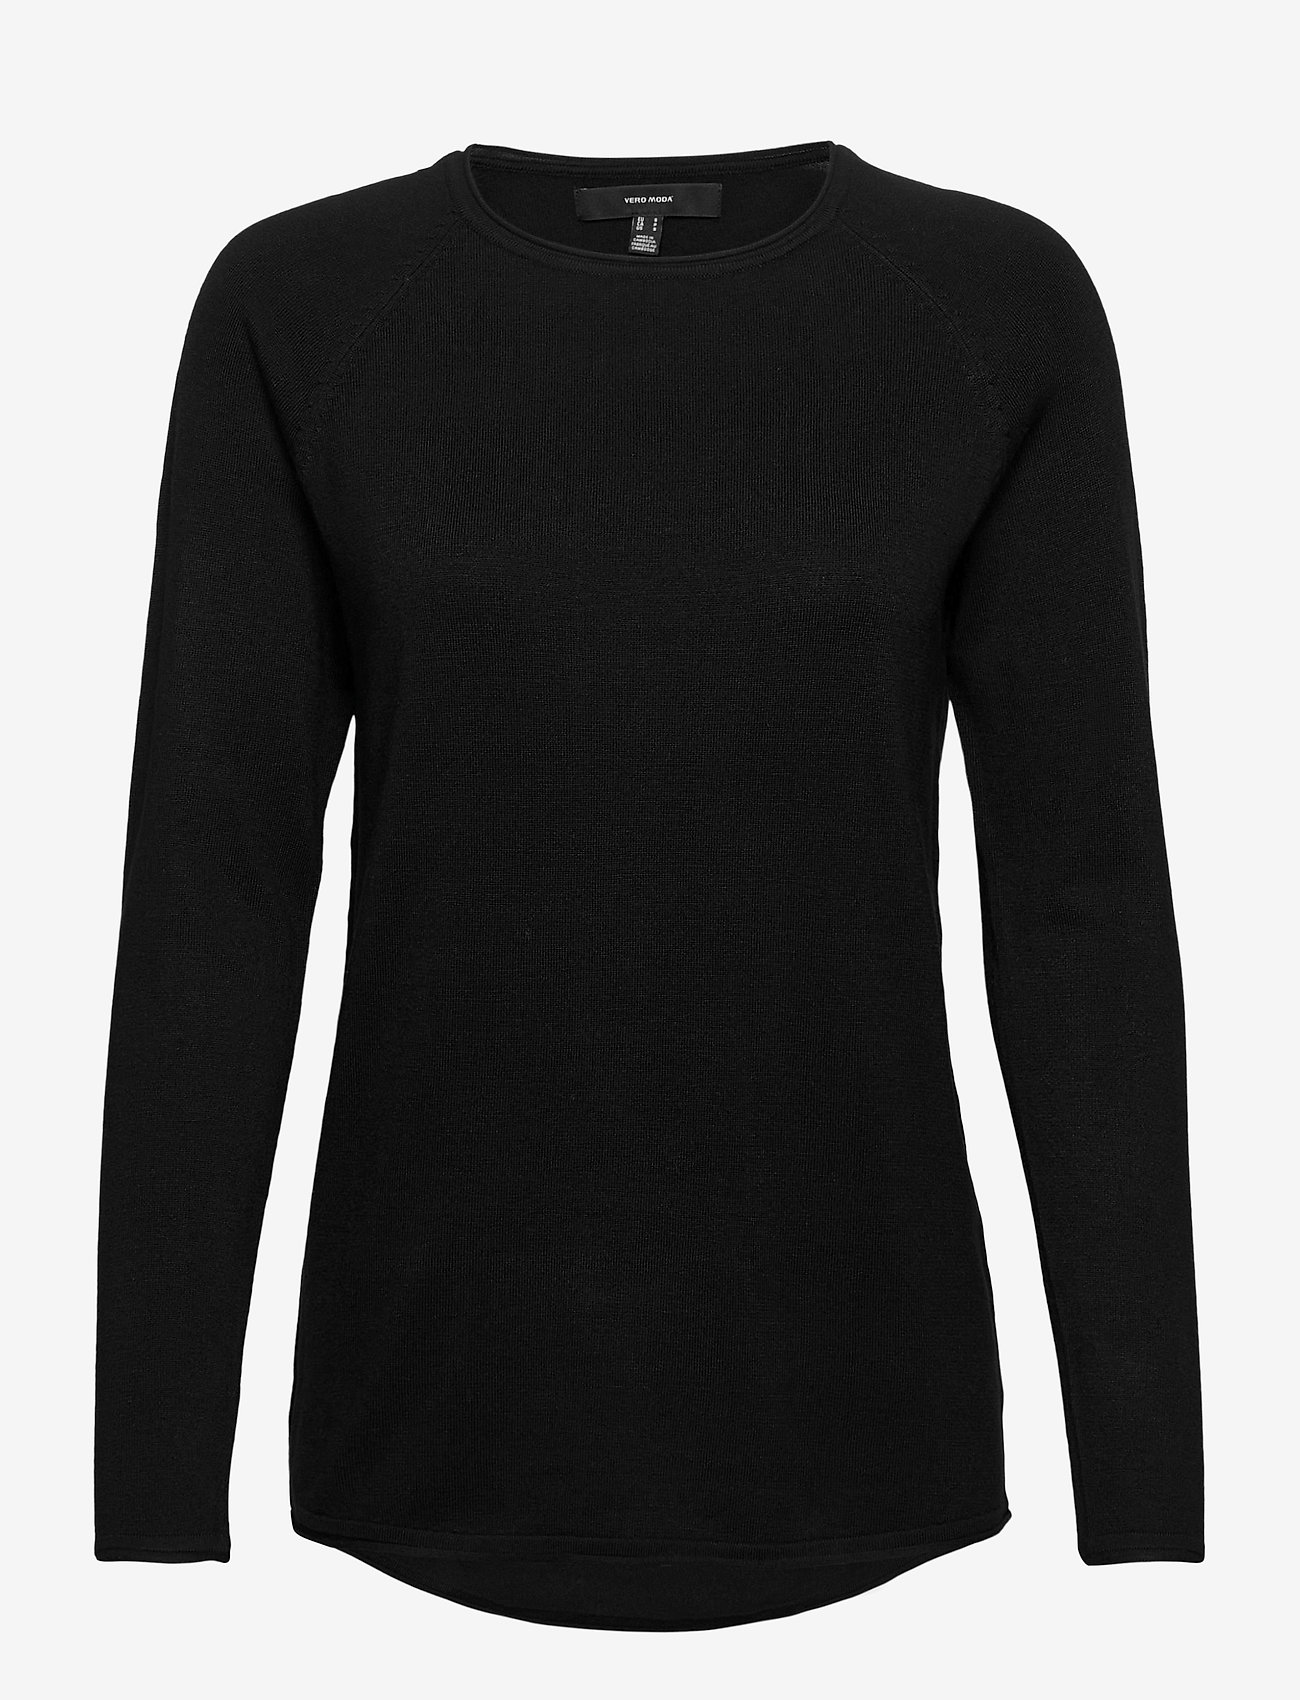 Vero Moda - VMNELLIE GLORY LS LONG BLOUSE - tröjor - black - 0